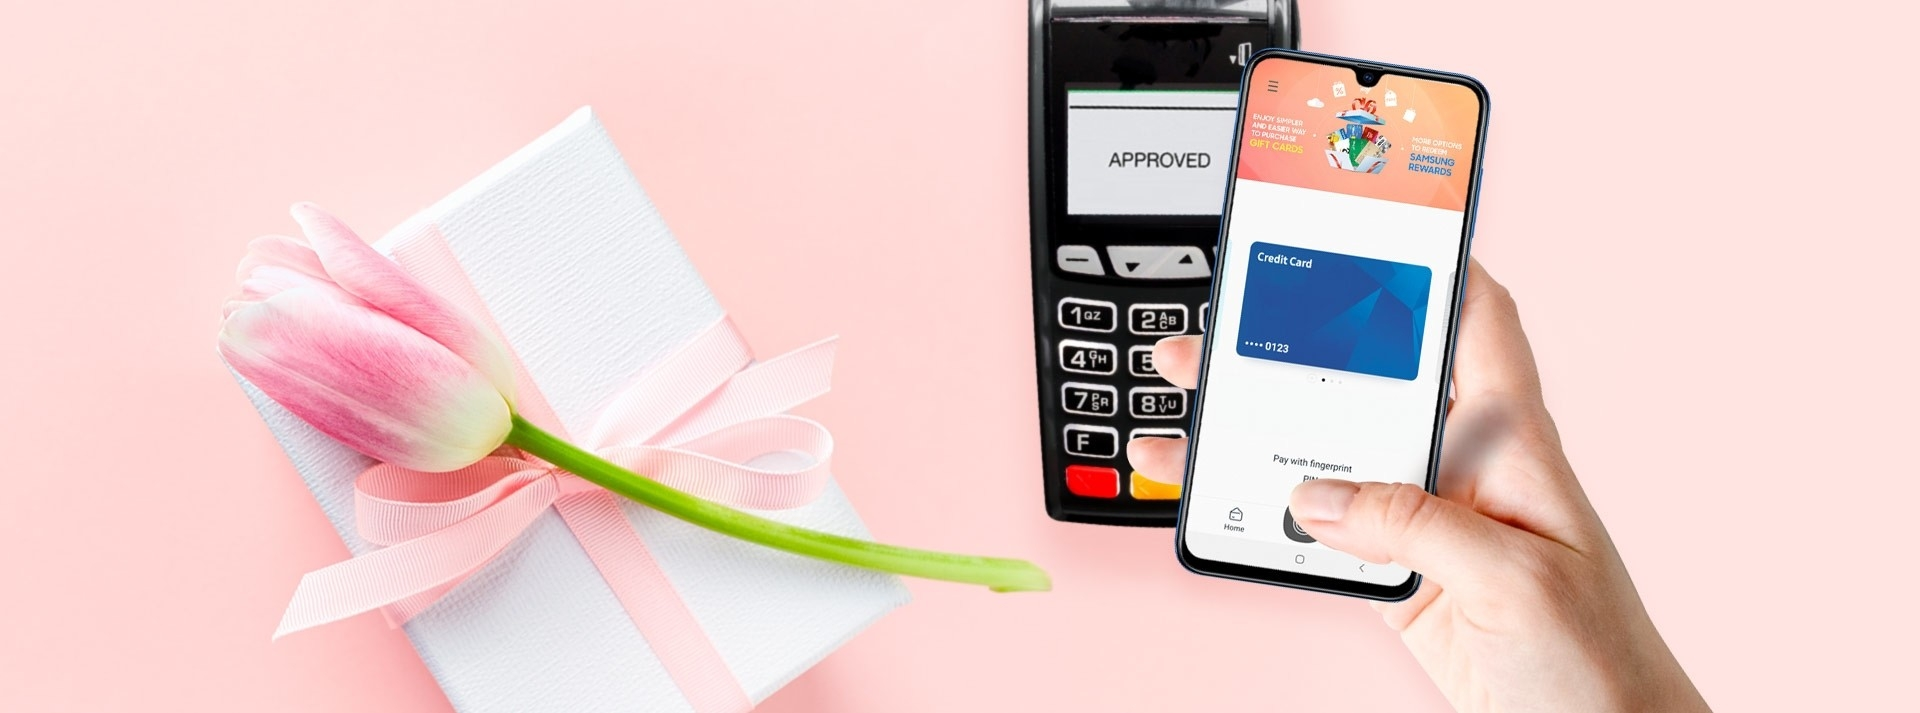 Samsung Galaxy A70 Samsung Pay